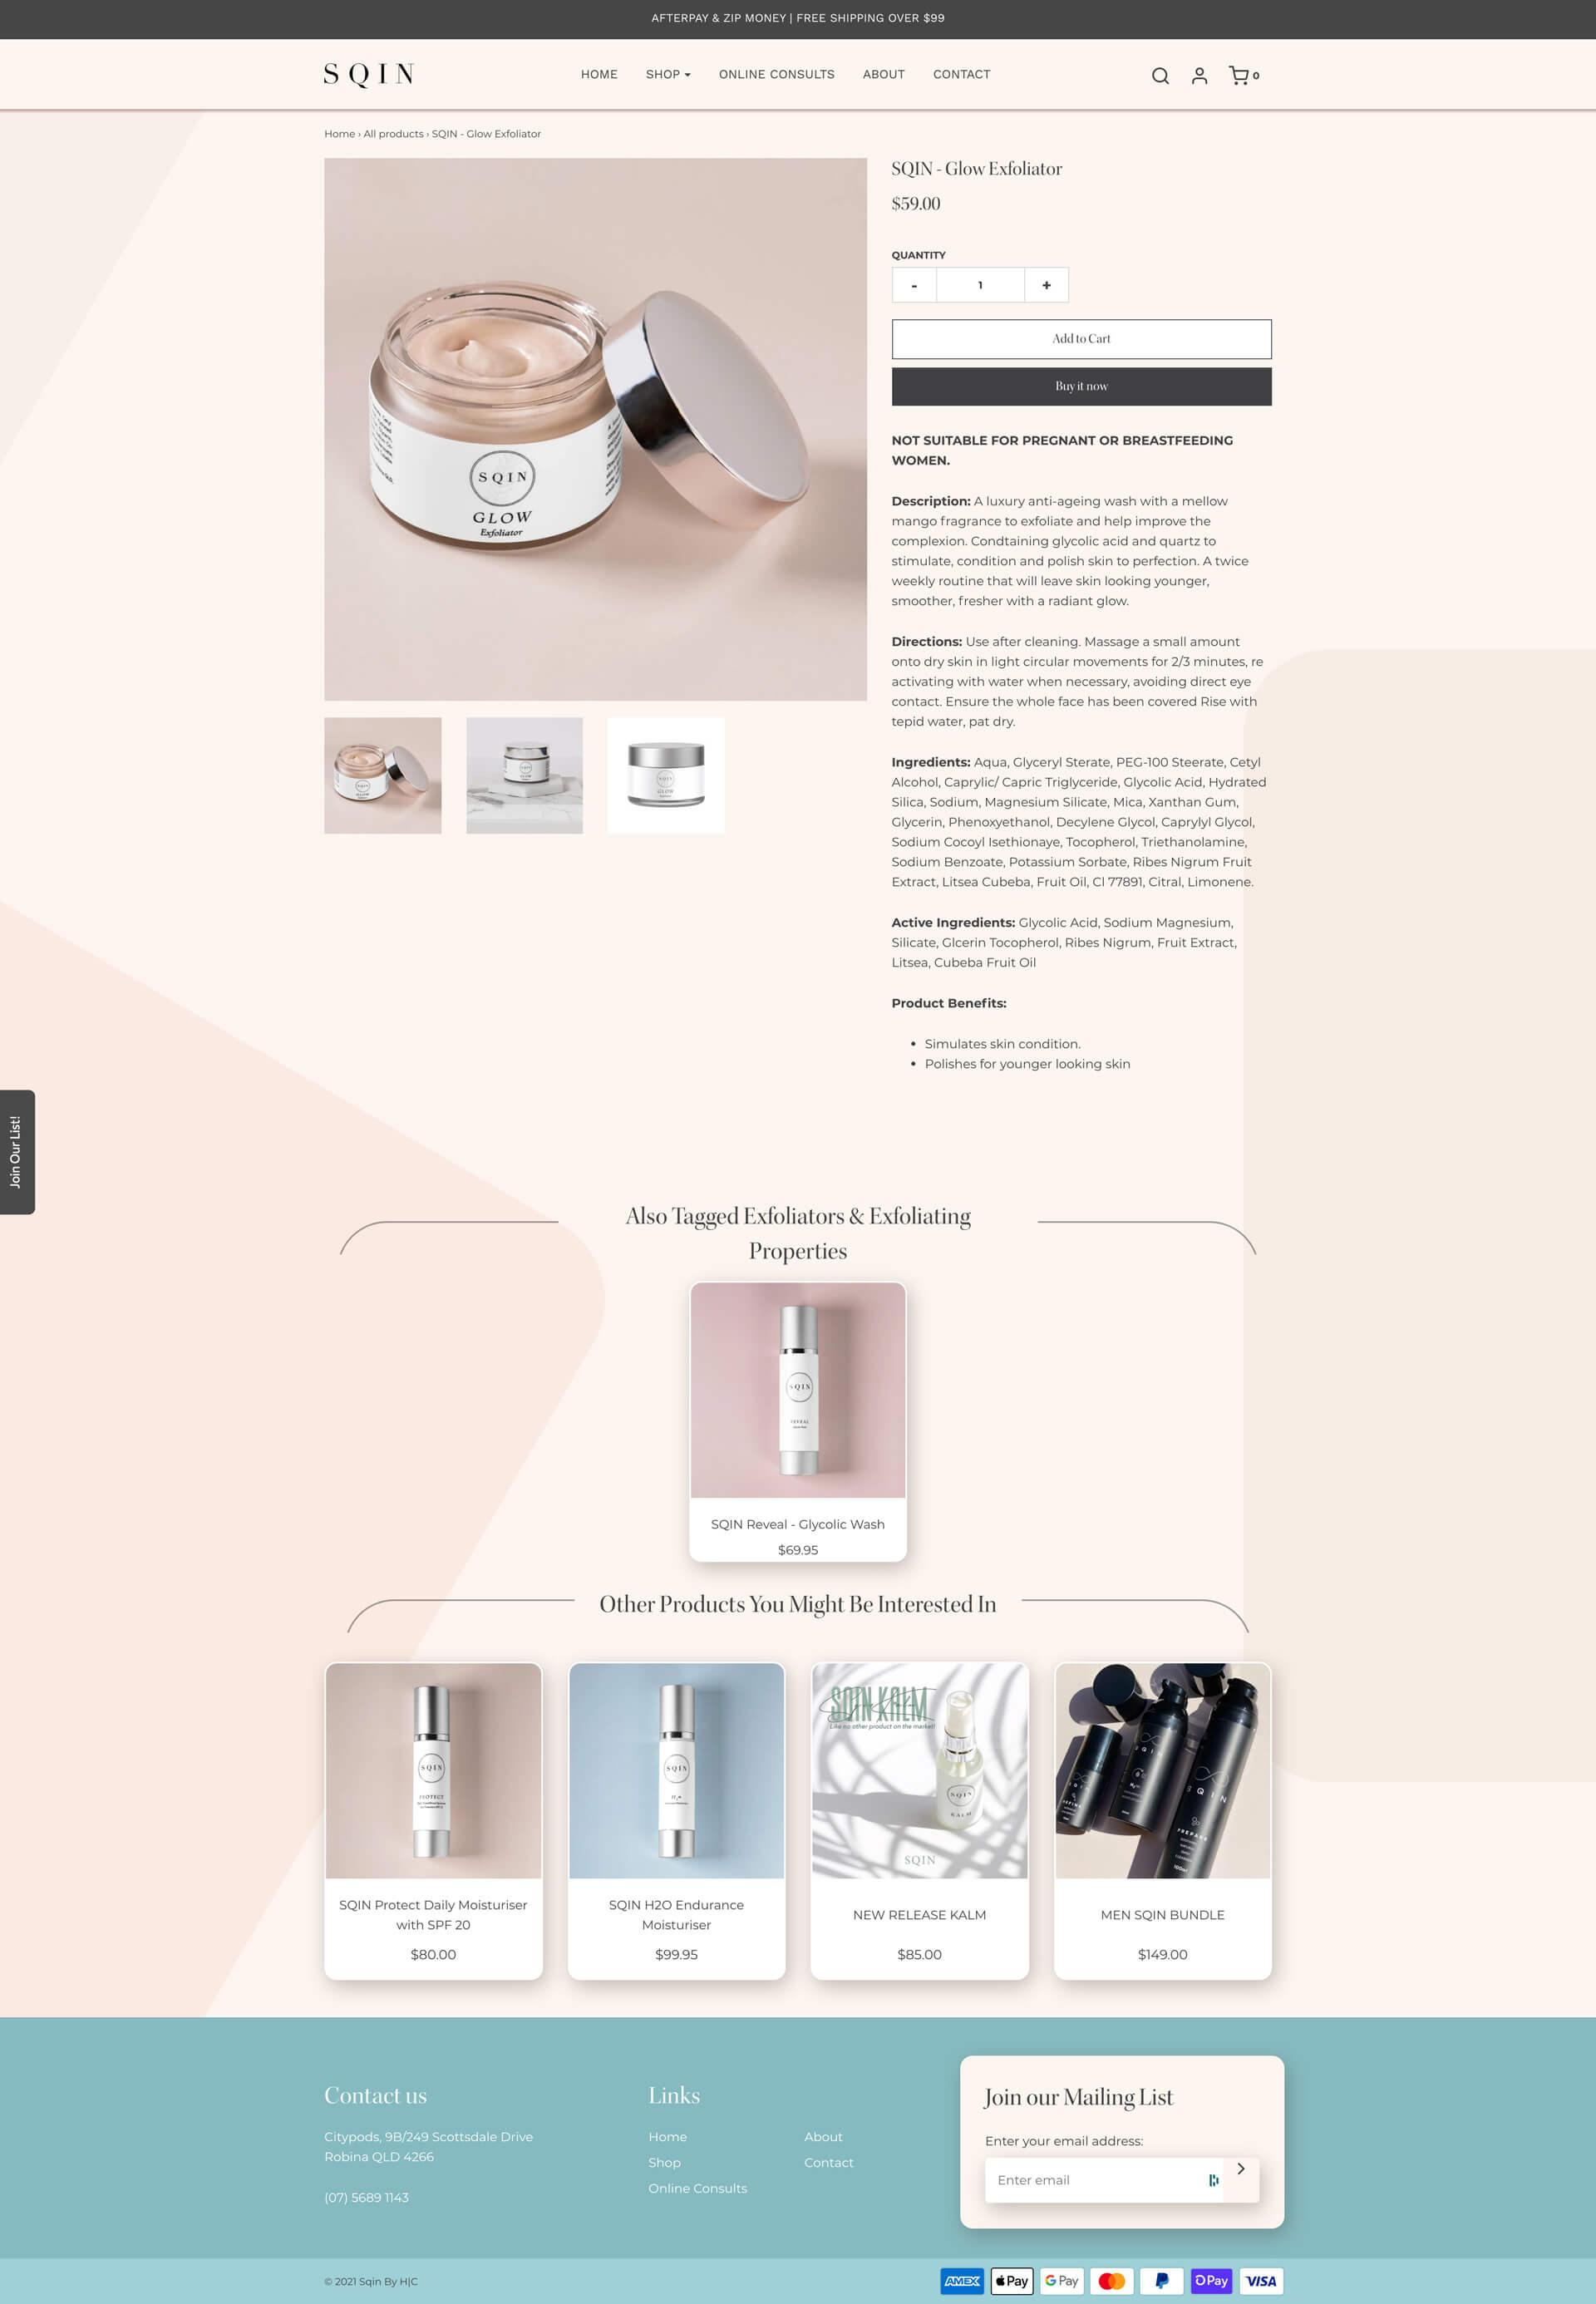 SQIN - Product Detail (Desktop)